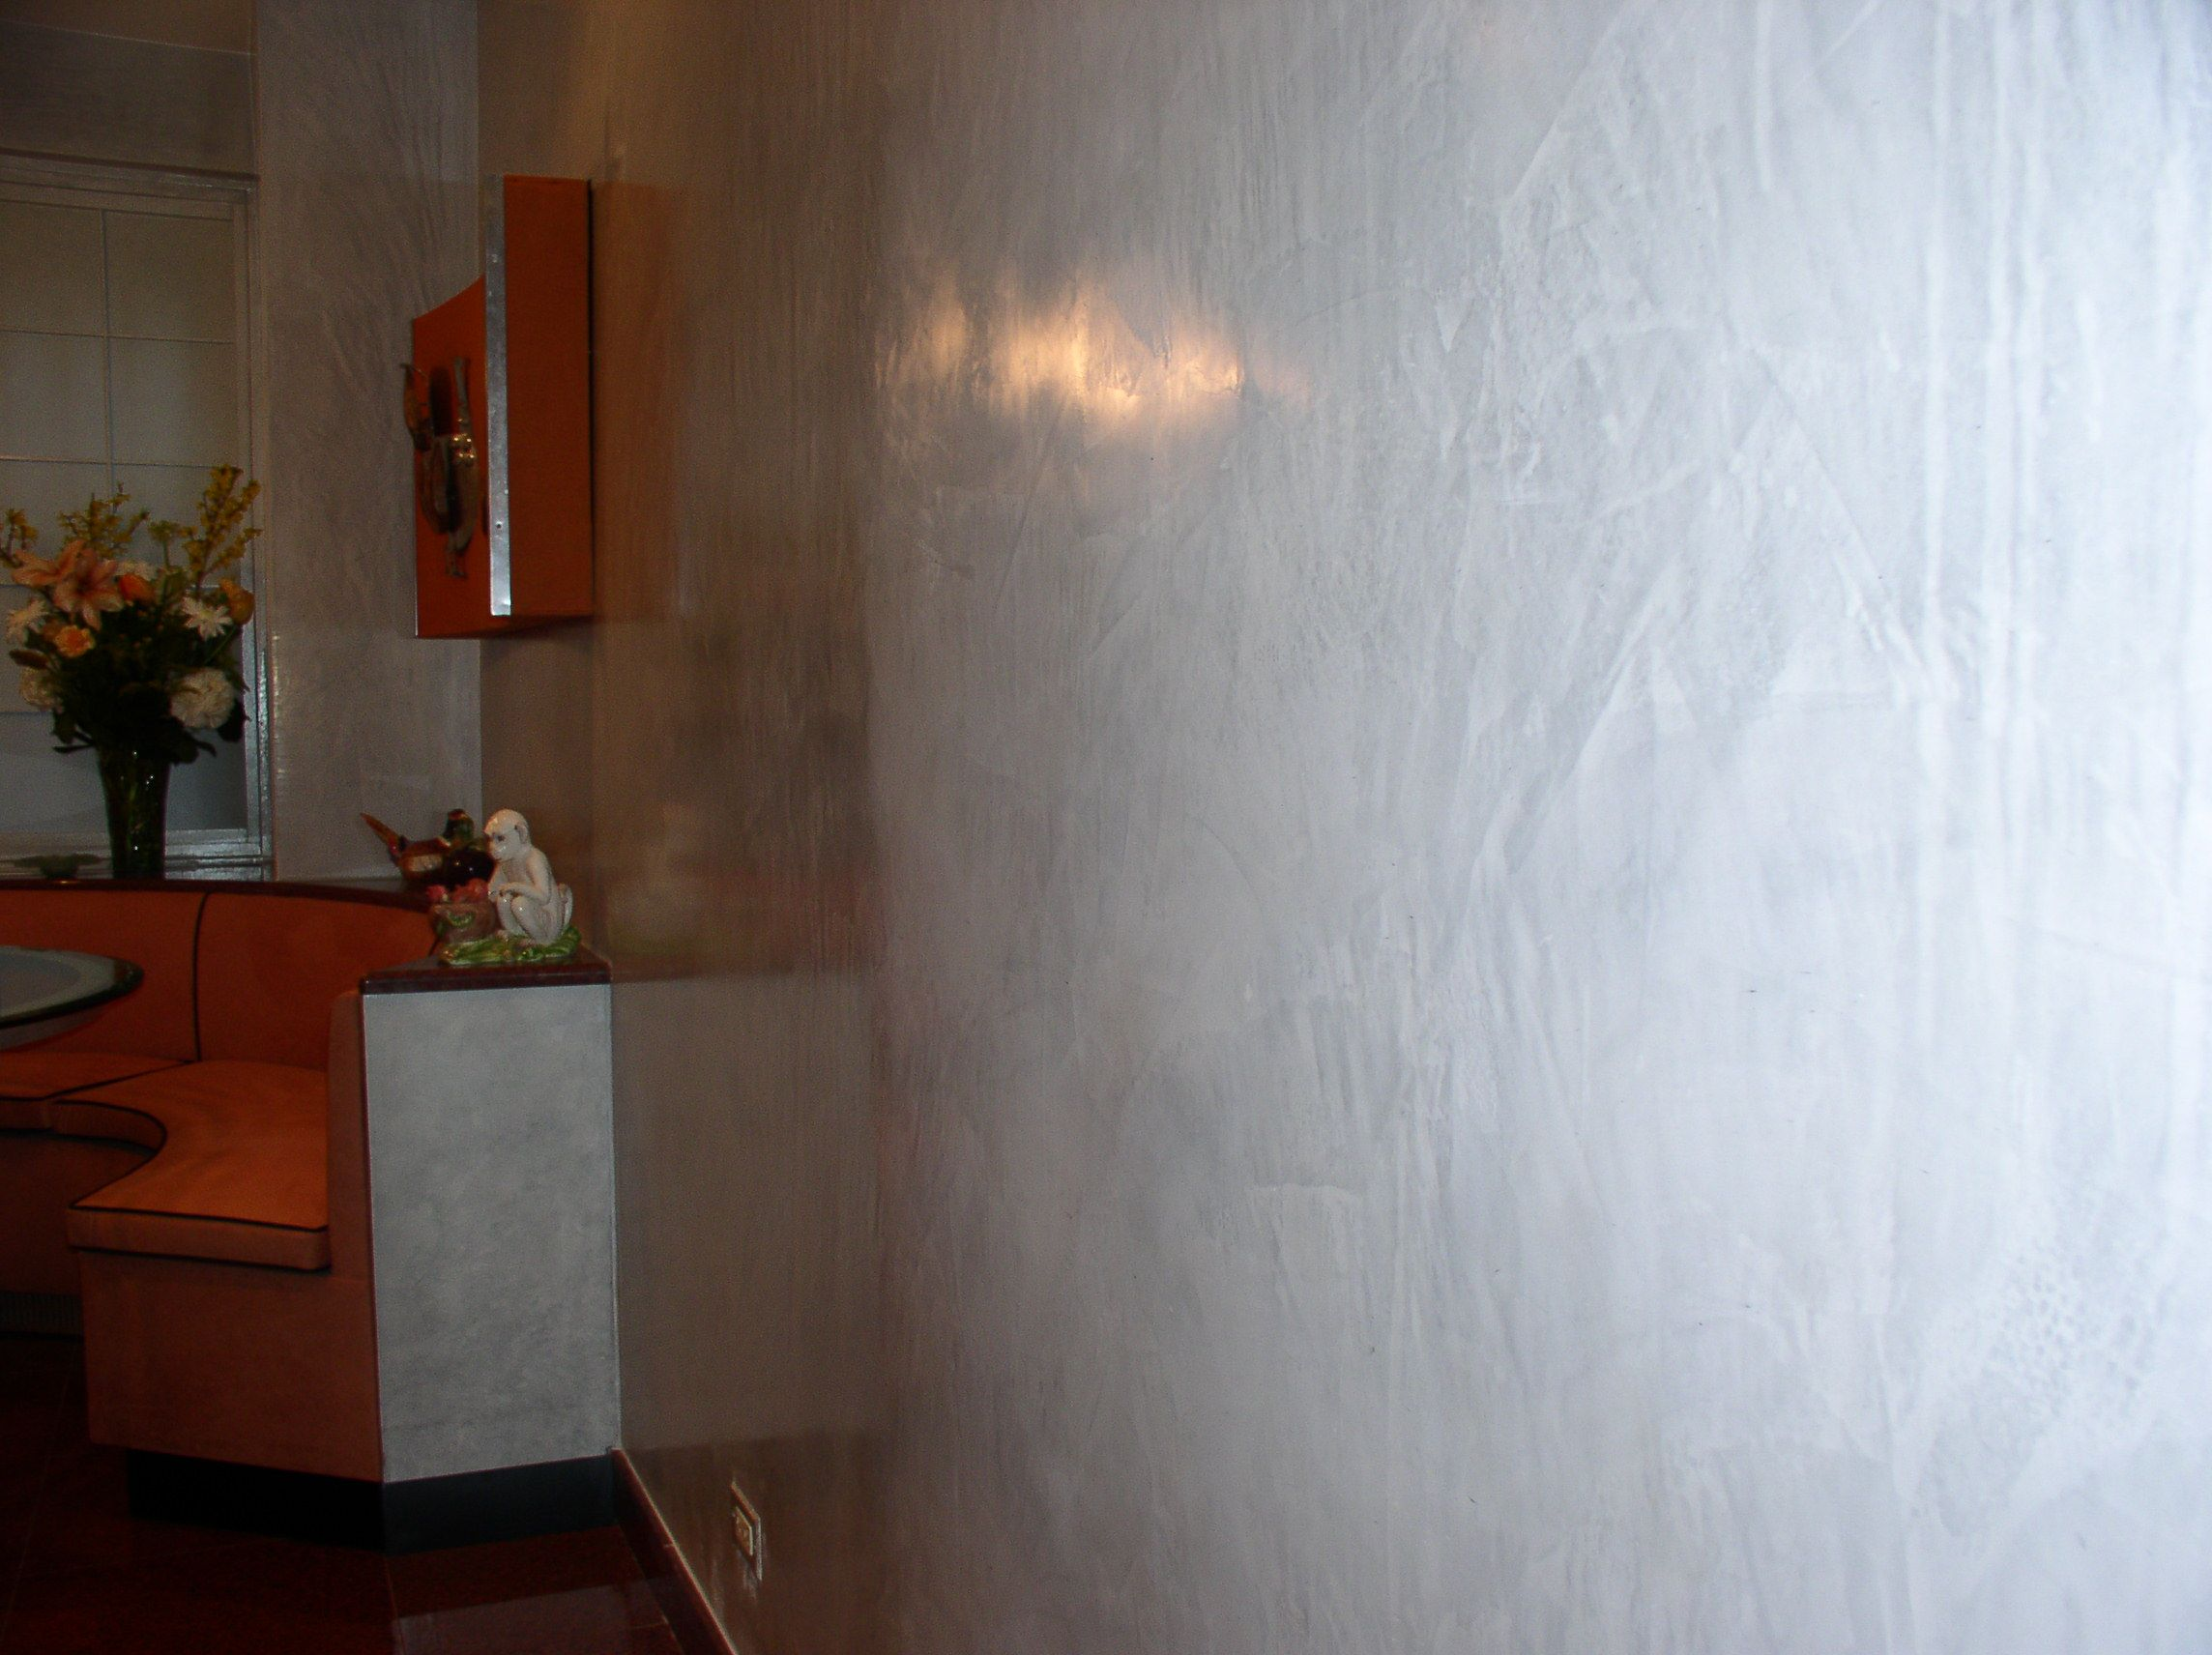 126 Jpg 2 288 1 712 Pixels Cottage Style Decor Polished Plaster Venetian Plaster